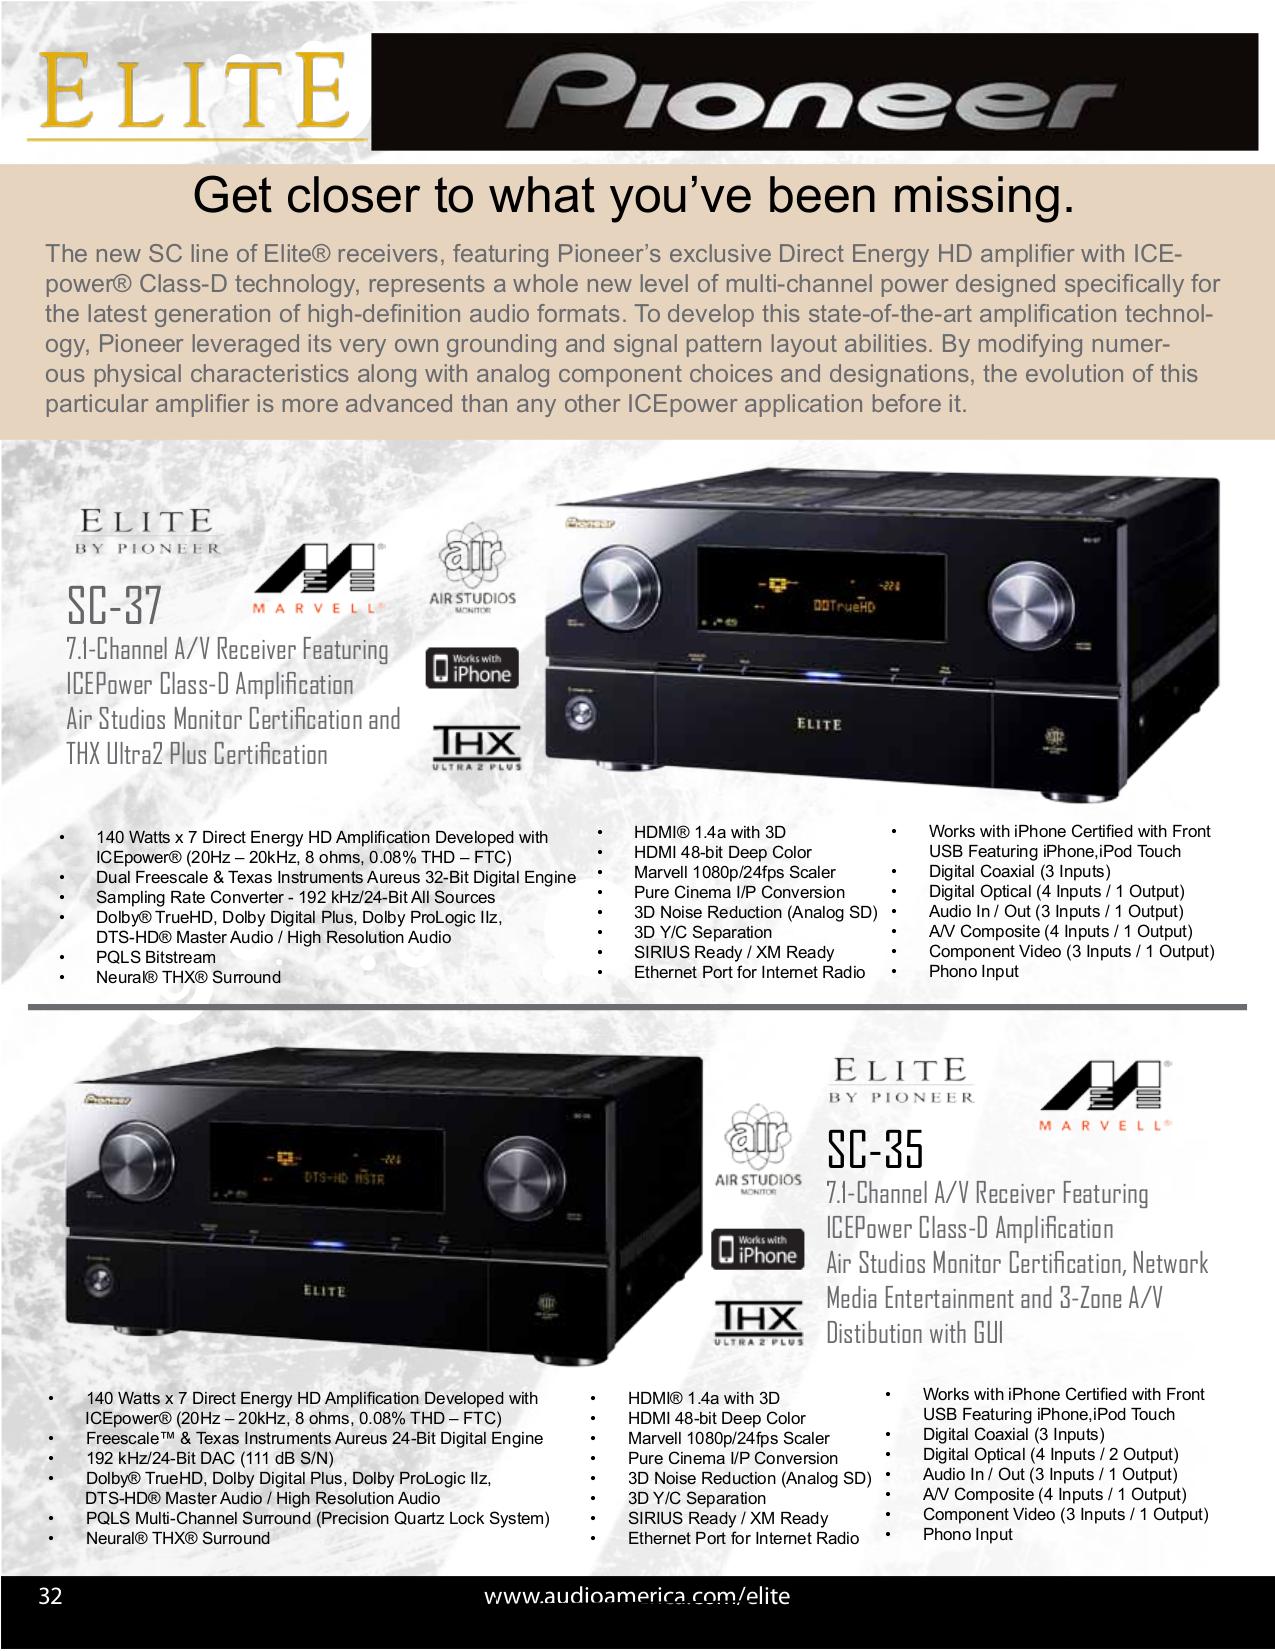 pdf for Niles Speaker RS6 Speckled Granite manual